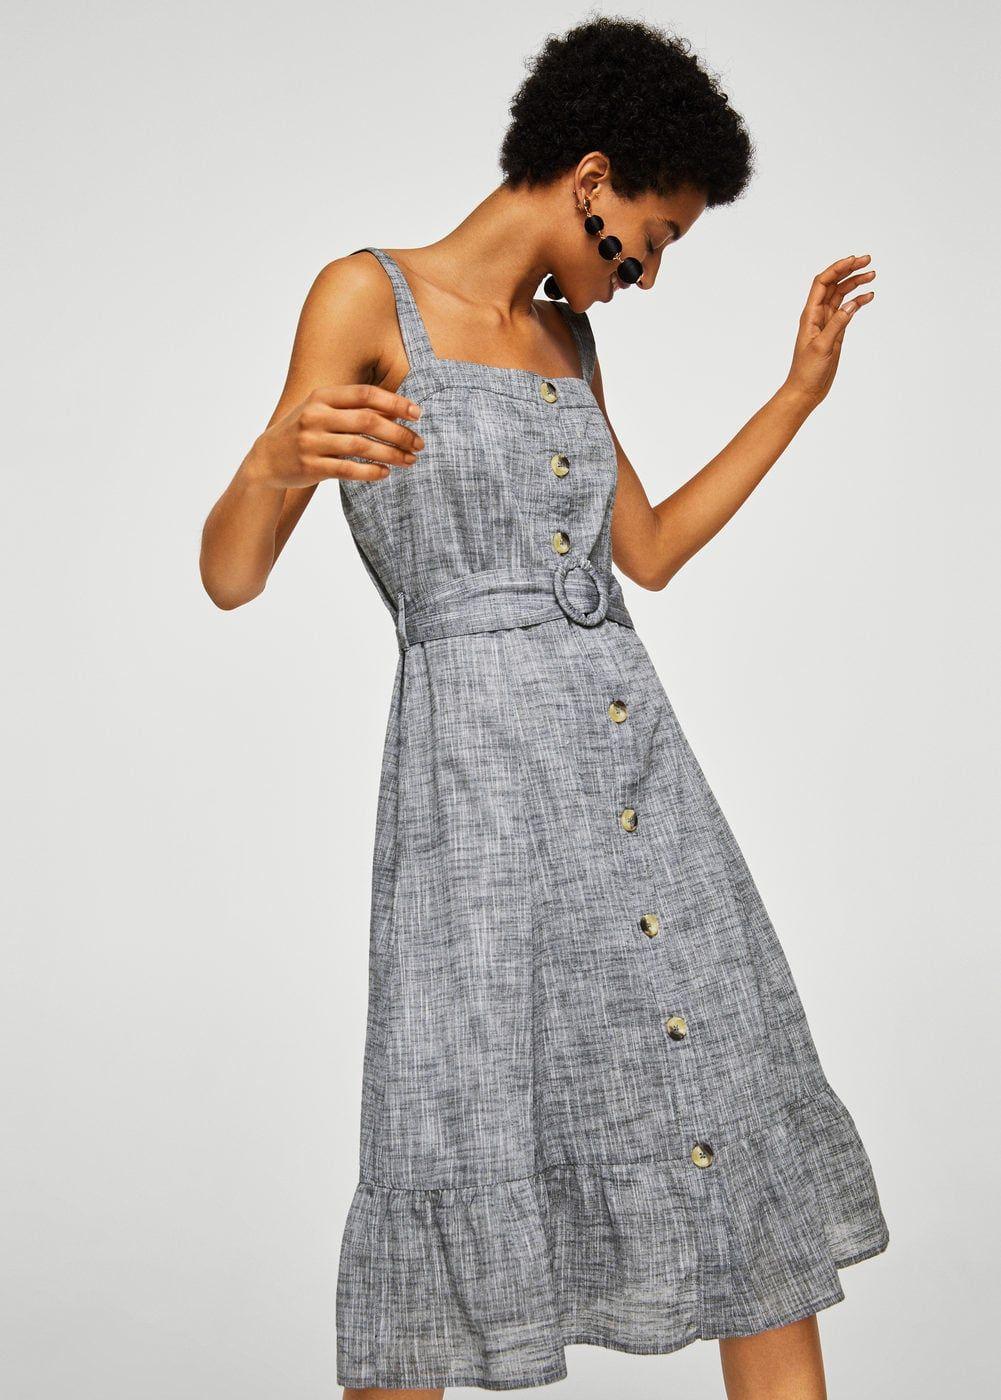 28c178b891 Cotton fabric Heather fabric Fitted design Belt buckle closure Spaghetti  straps Square neckline Ruffled hem